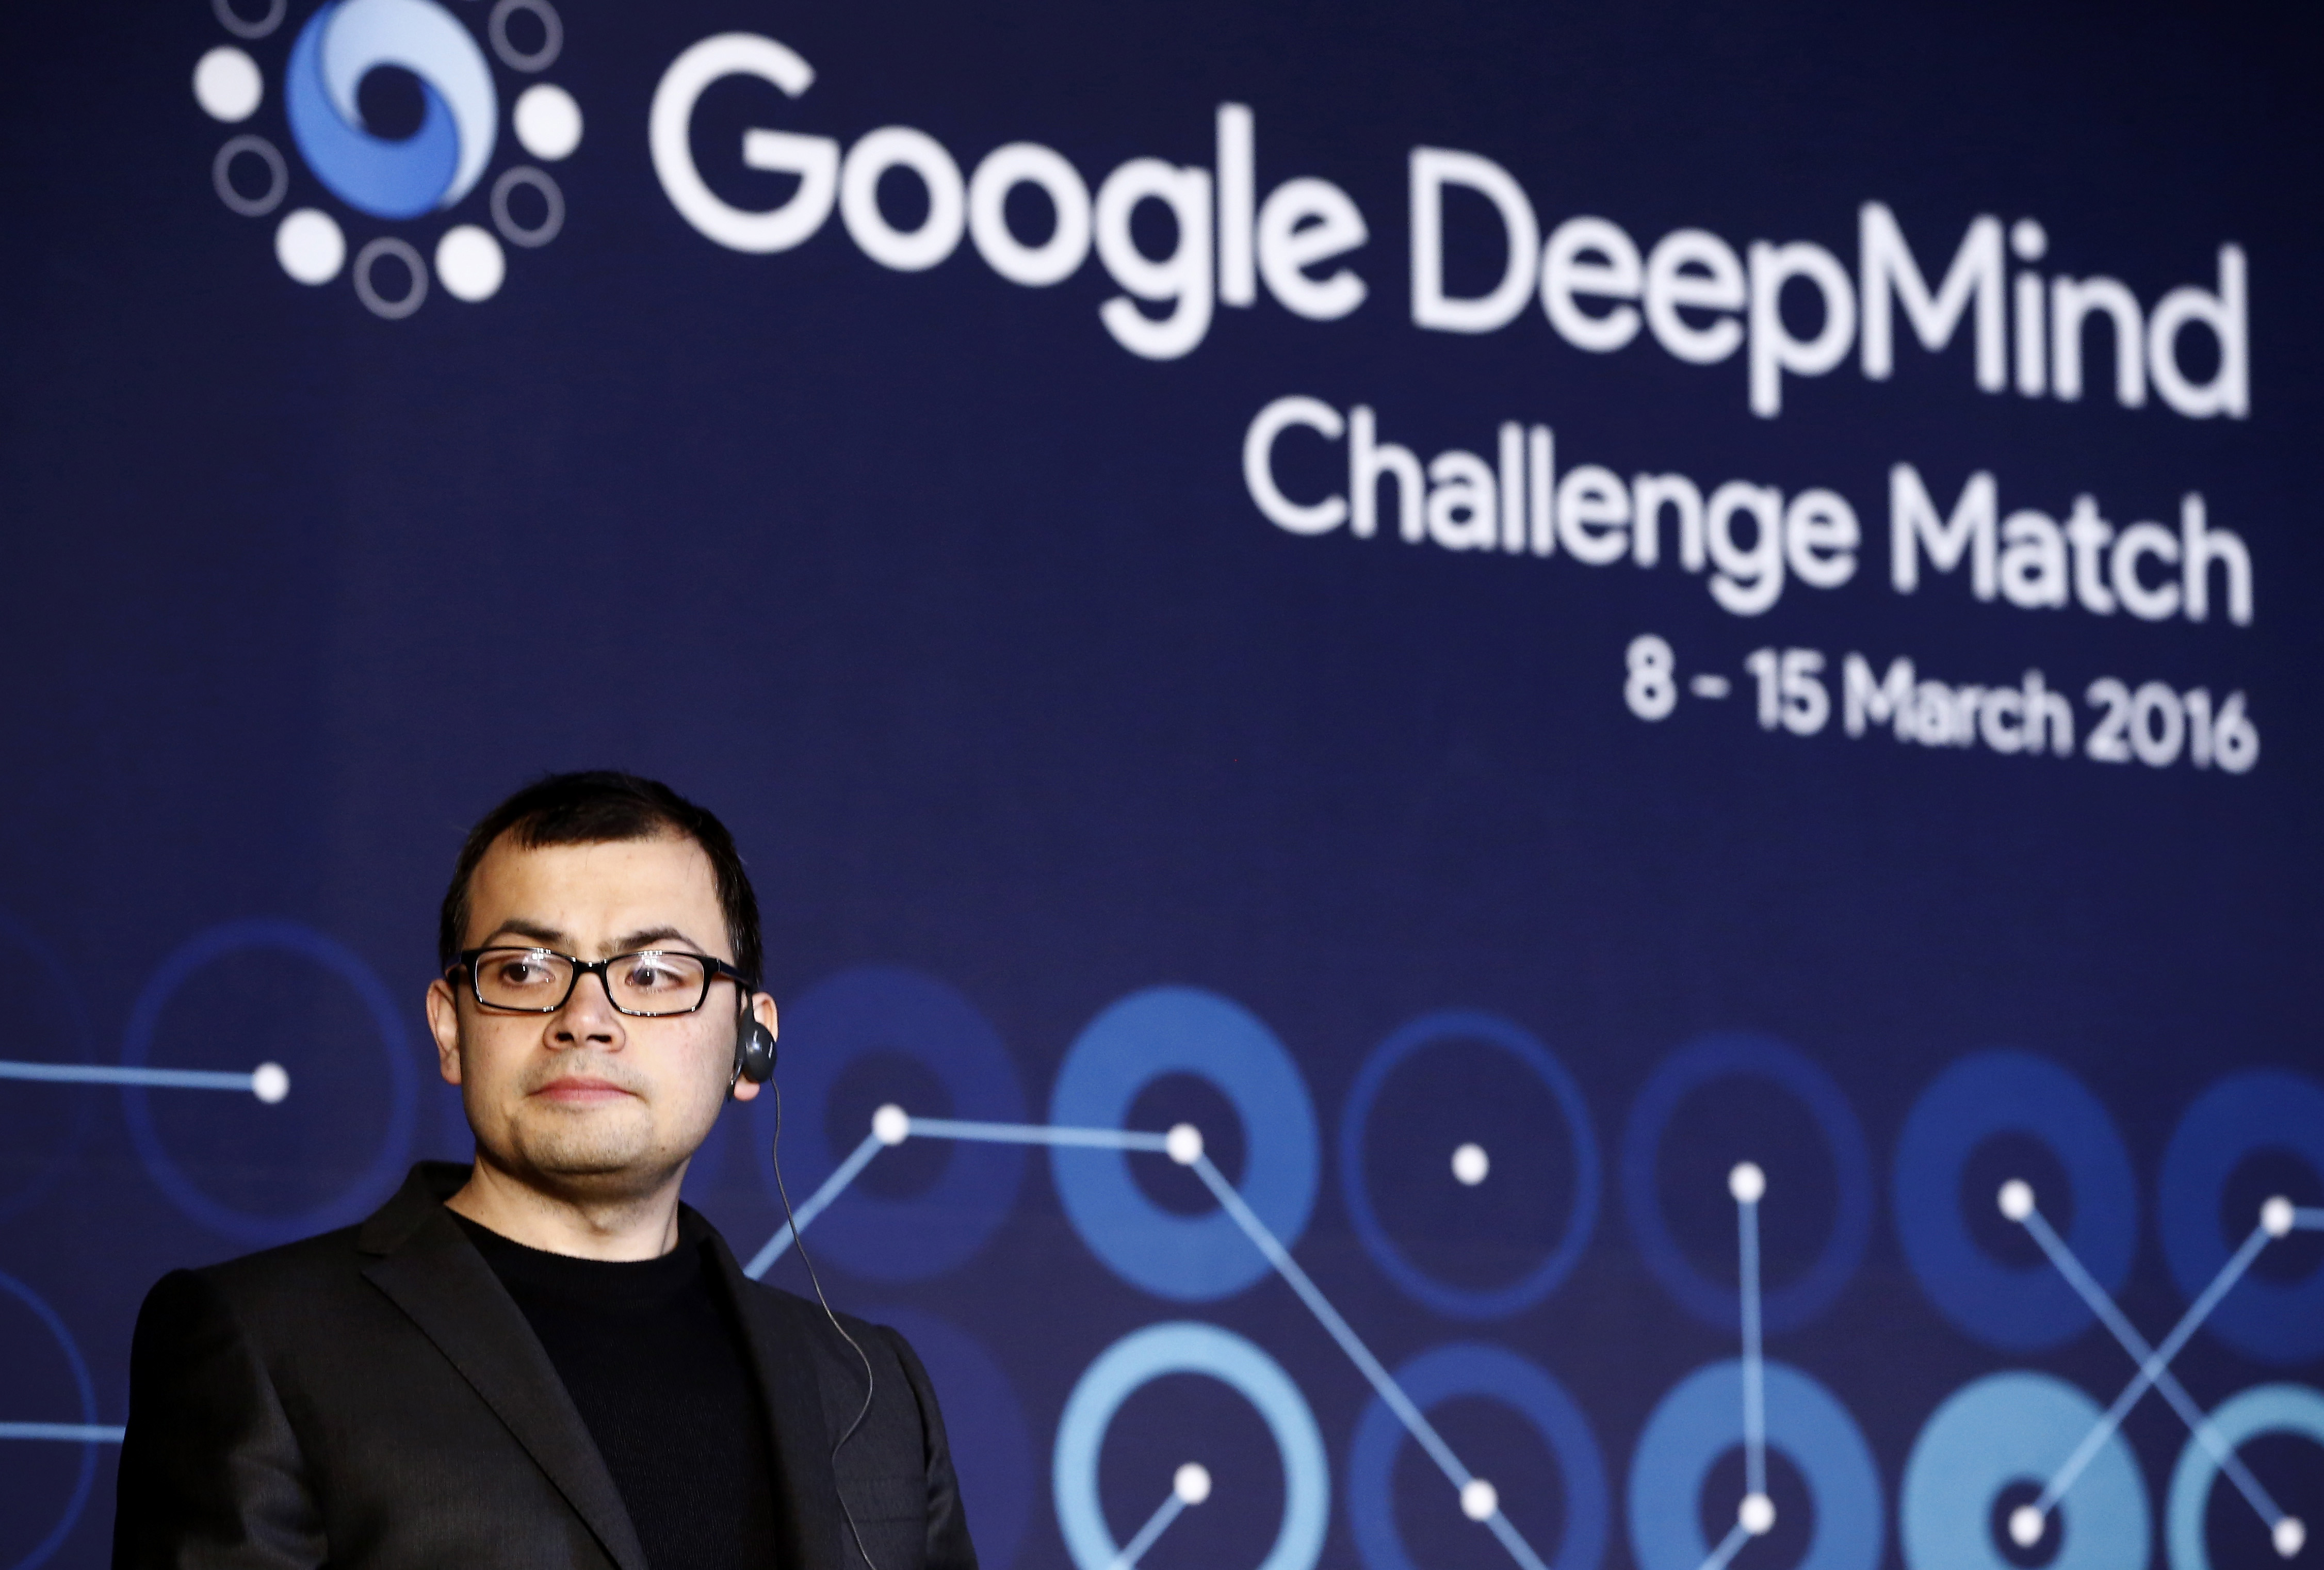 Professional 'Go' Player Lee Se-dol Plays Google's AlphaGo - Last Day